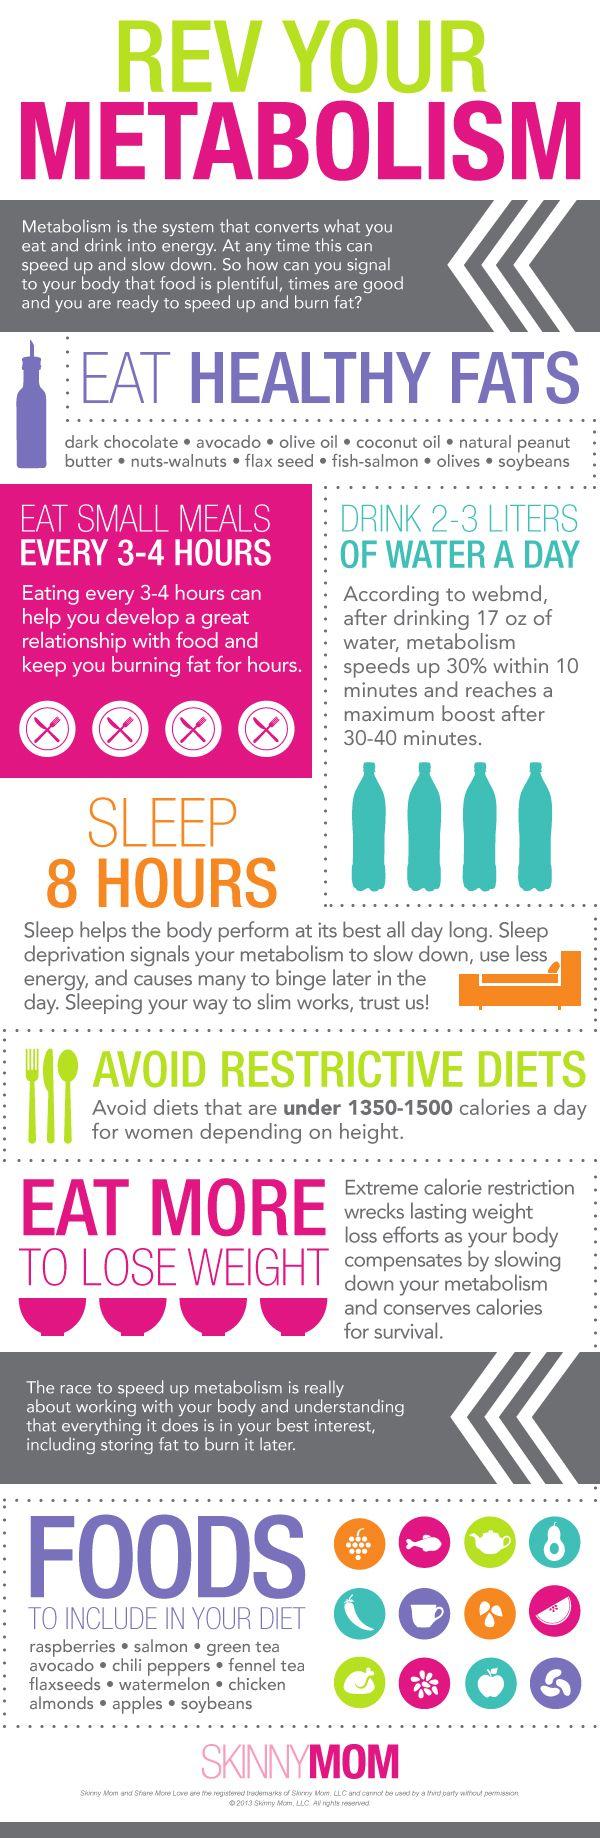 10 Skinny, Metabolism-Revving Breakfasts | Skinny Mom | Where Moms Get The Skinny On Healthy Living